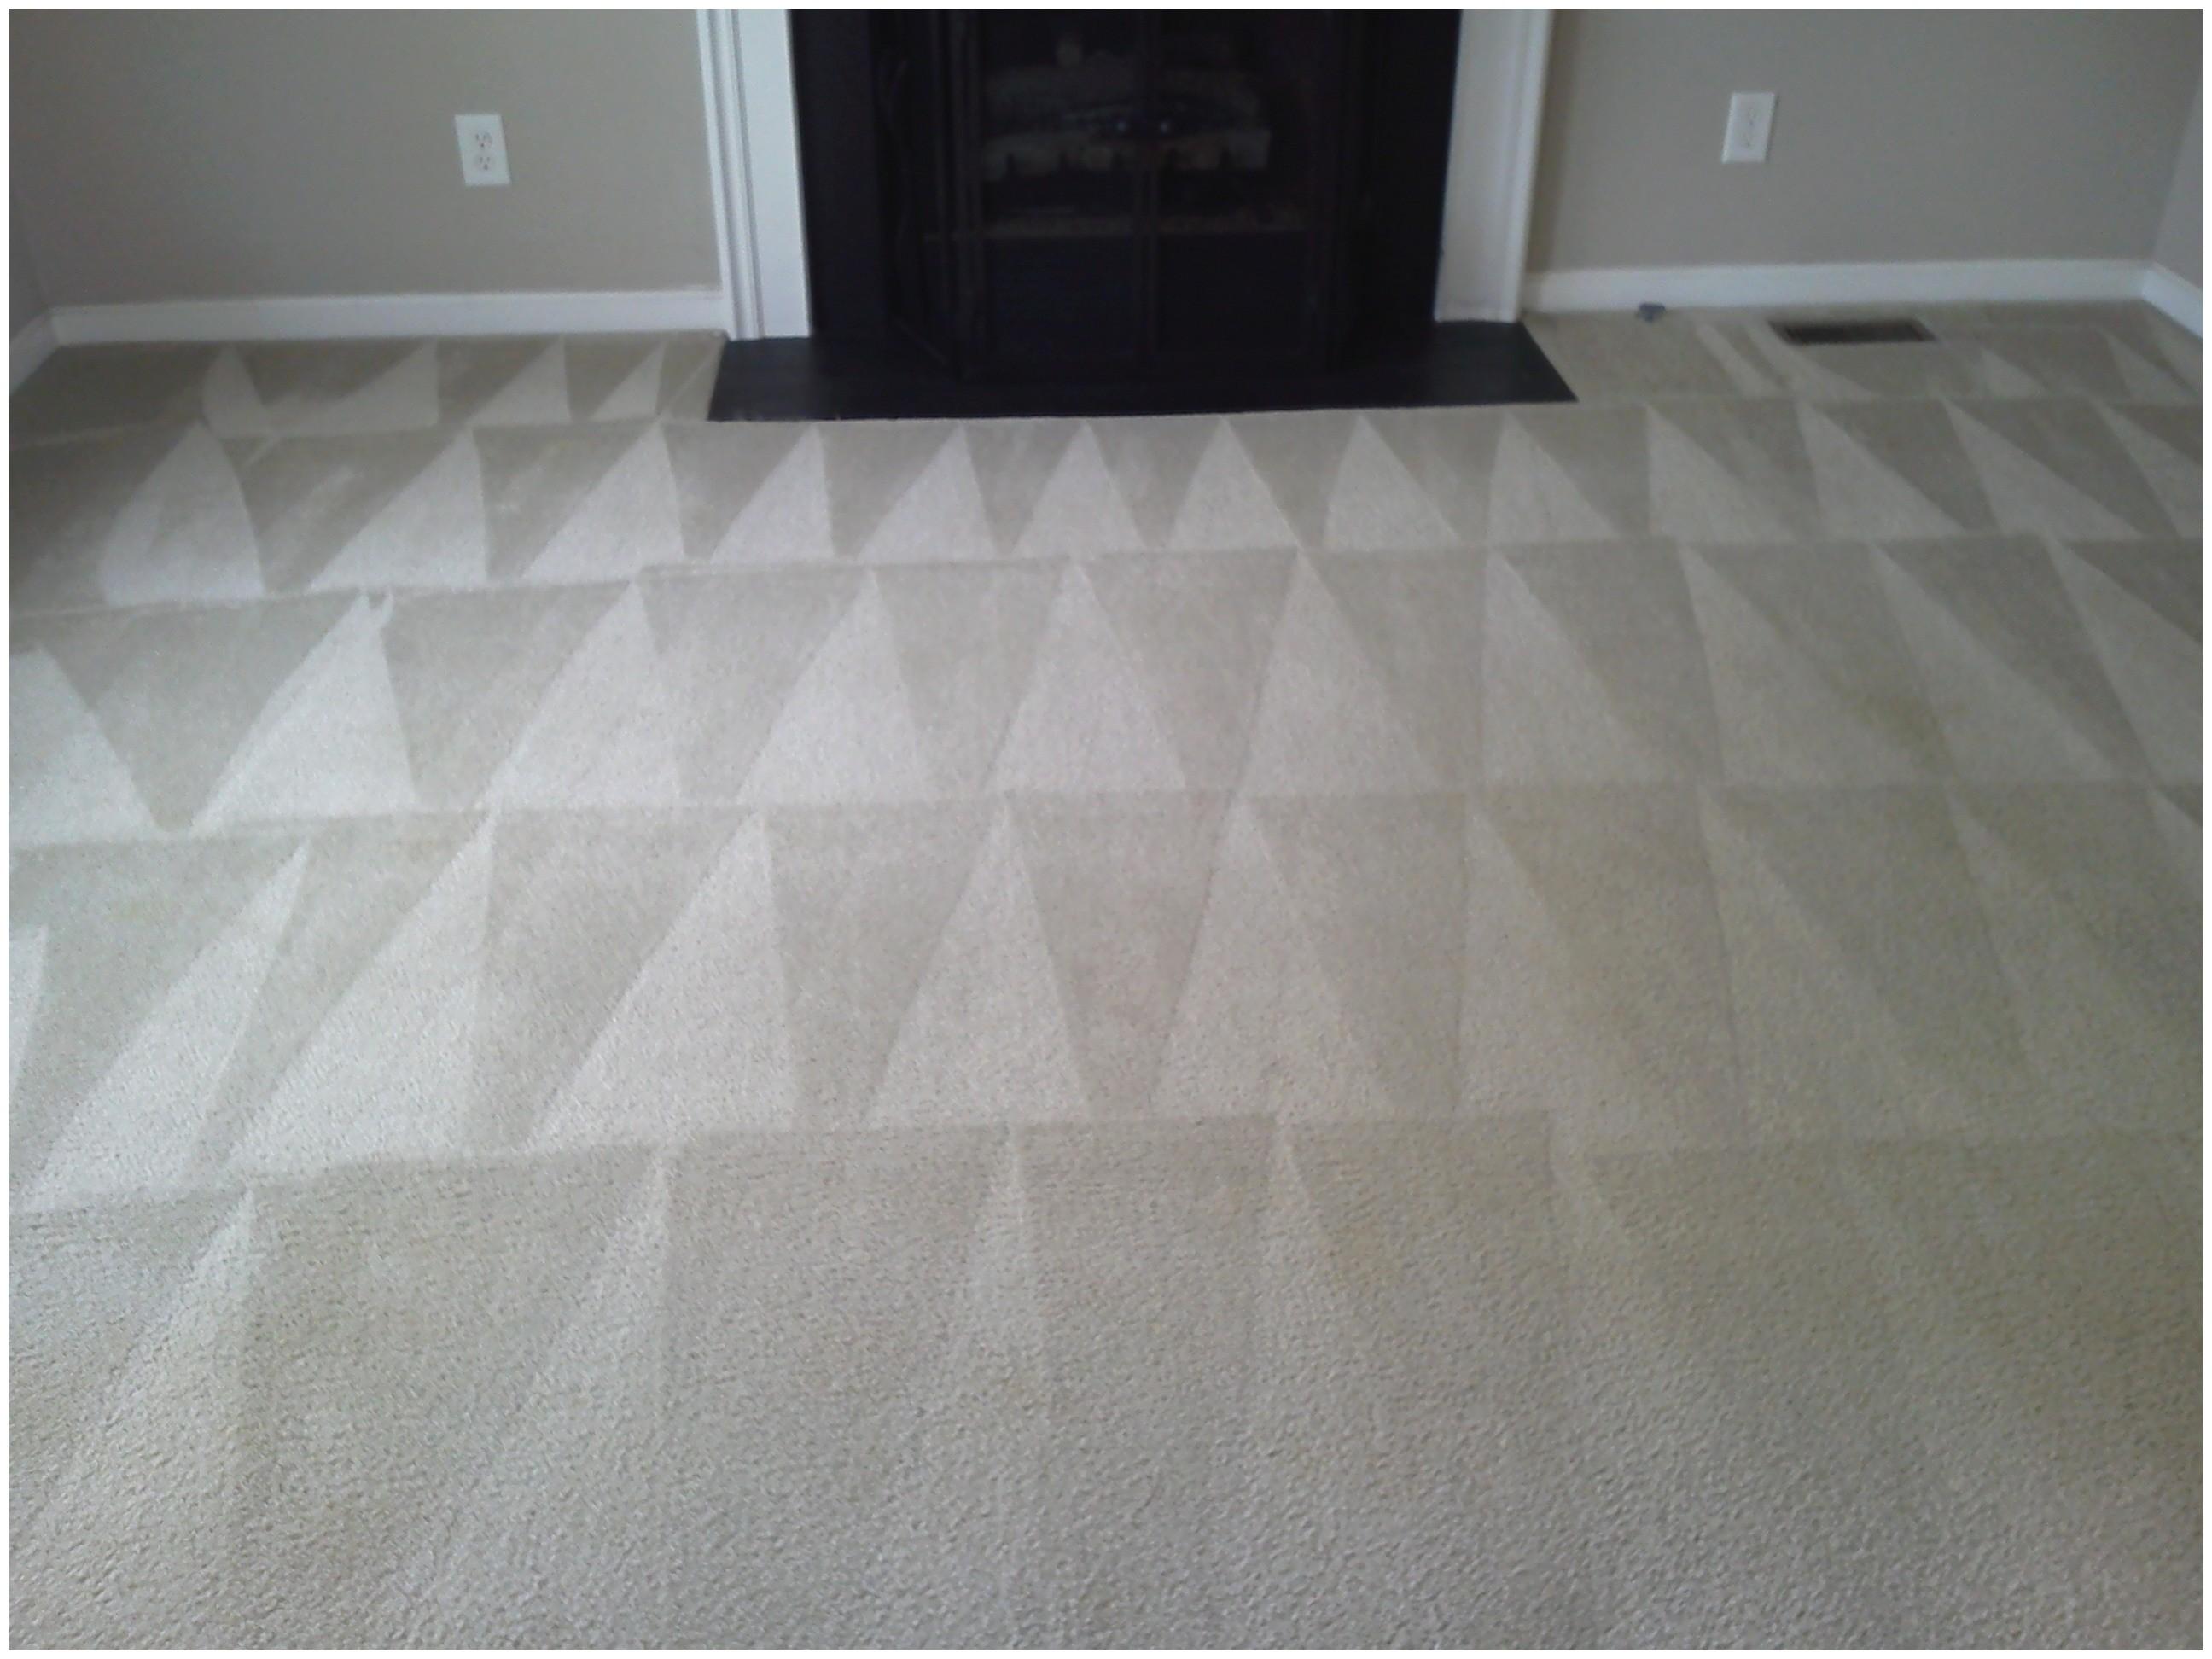 Carpet Cleaners Near Stafford Va Carpet Cleaning Stafford Virginia Carpet Vidalondon